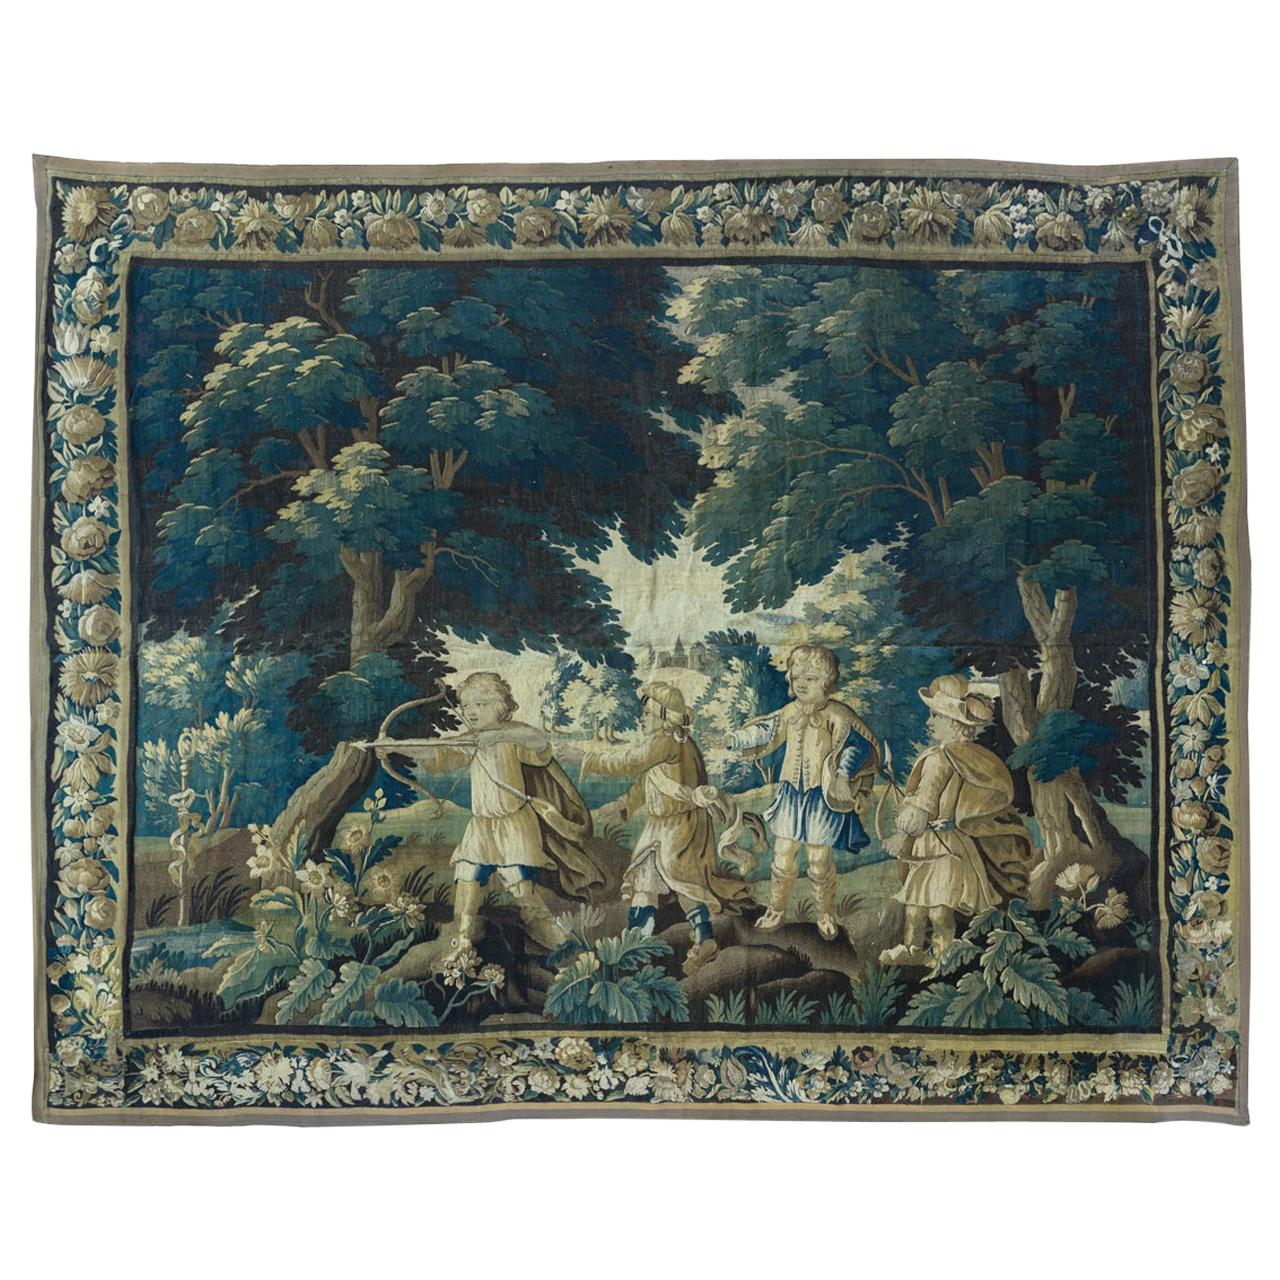 Antique 17th Century Flemish Verdure Tapestry with Children